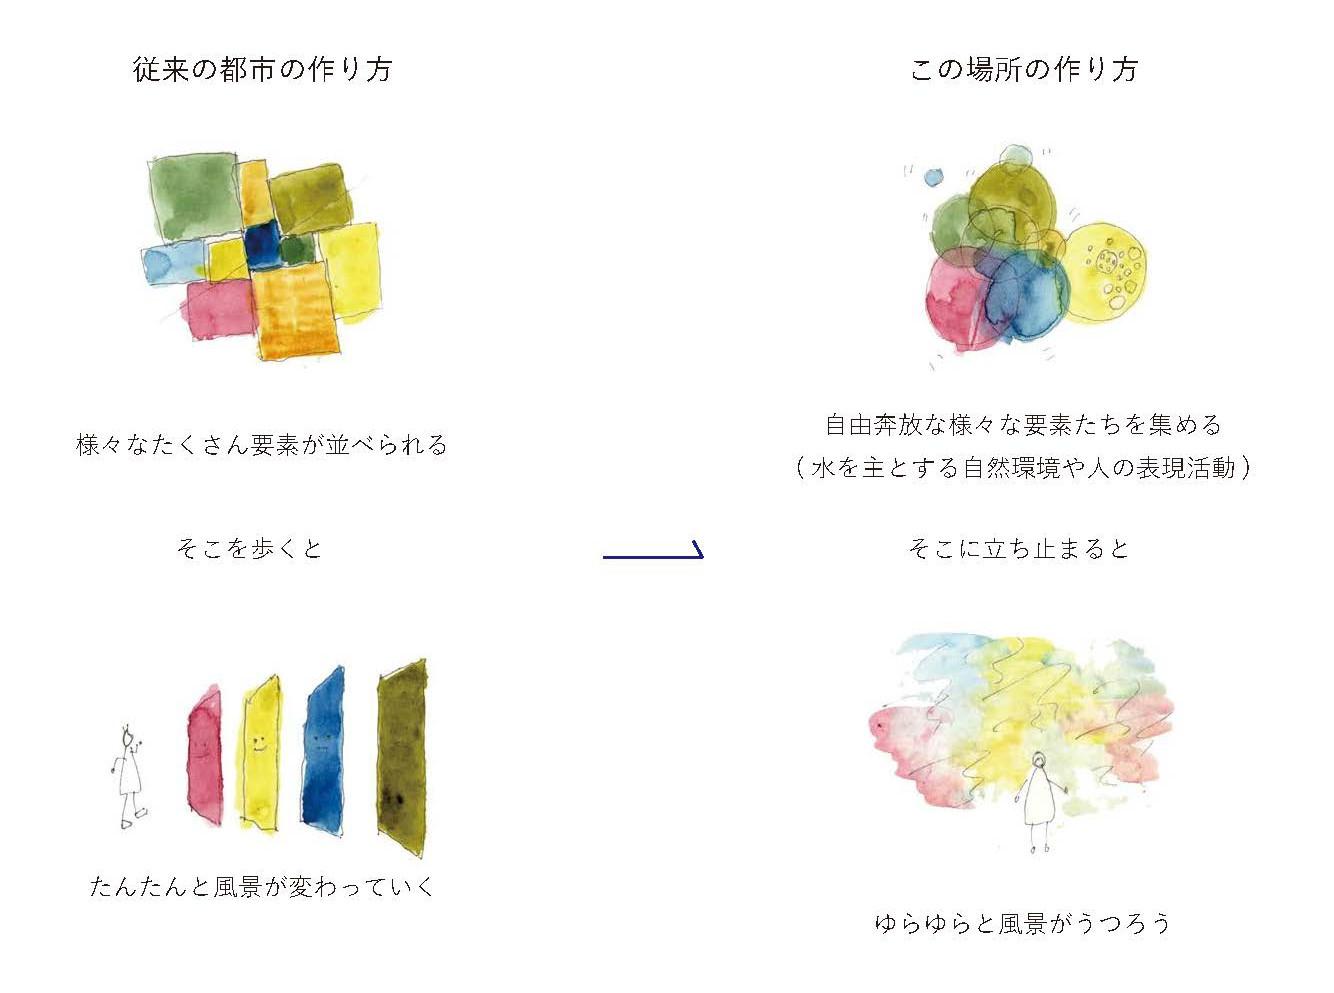 建築展WEB水辺_ページ_02.jpg